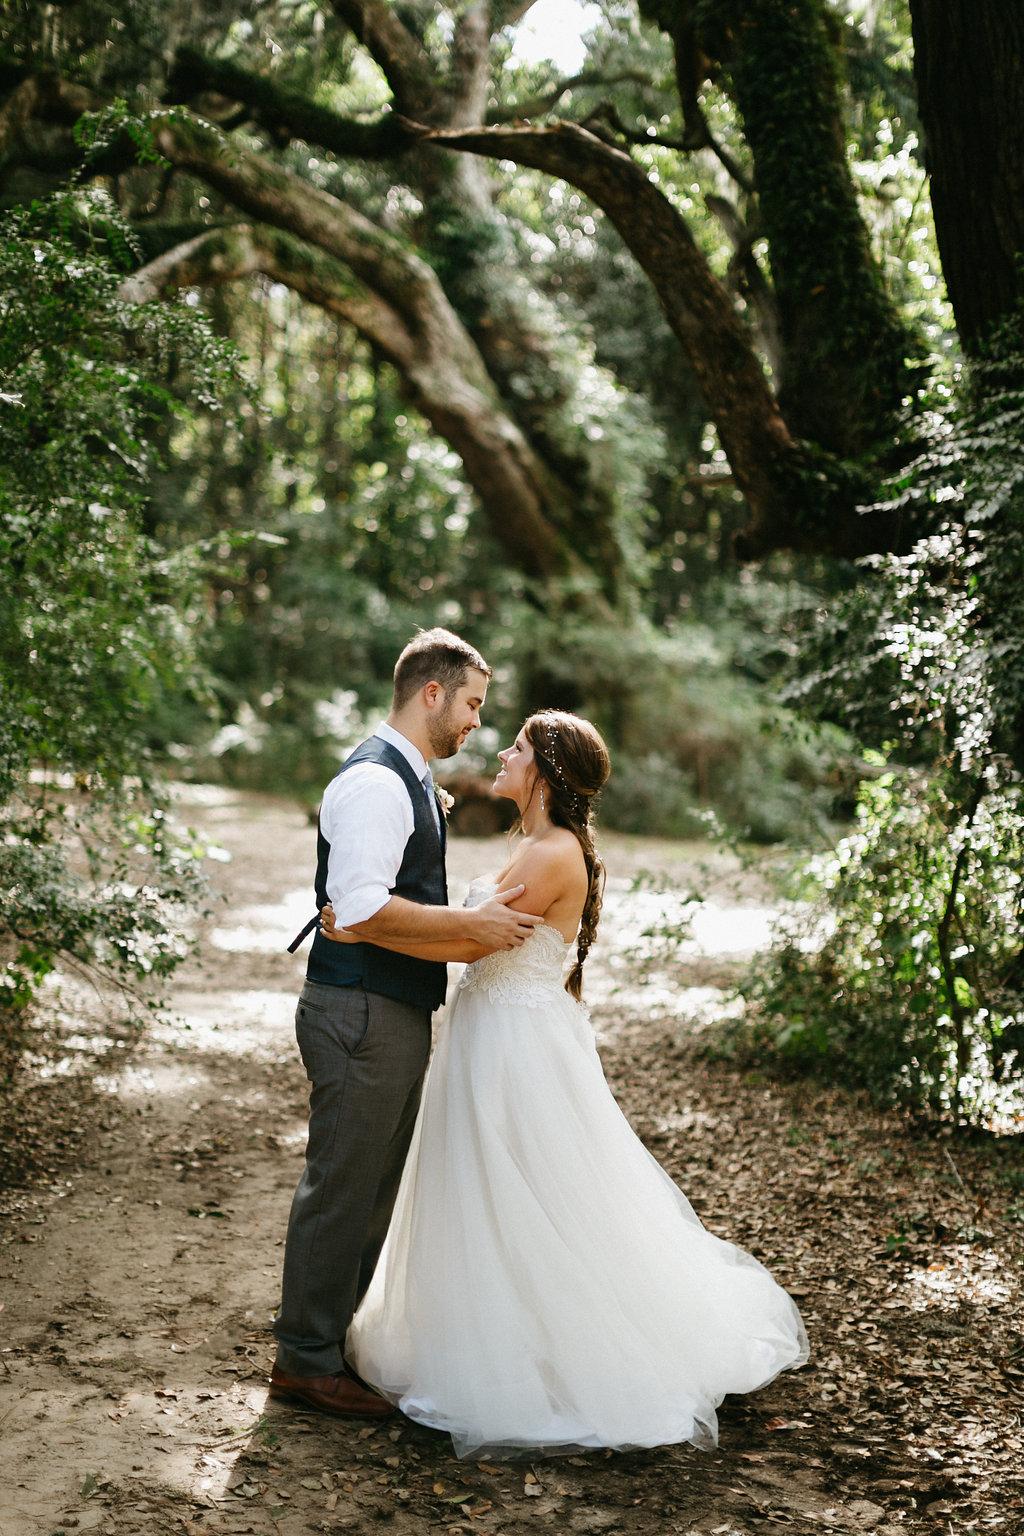 Wingate Plantation wedding on Johns Island l Charleston, SC photographer l Monika Gauthier Photography